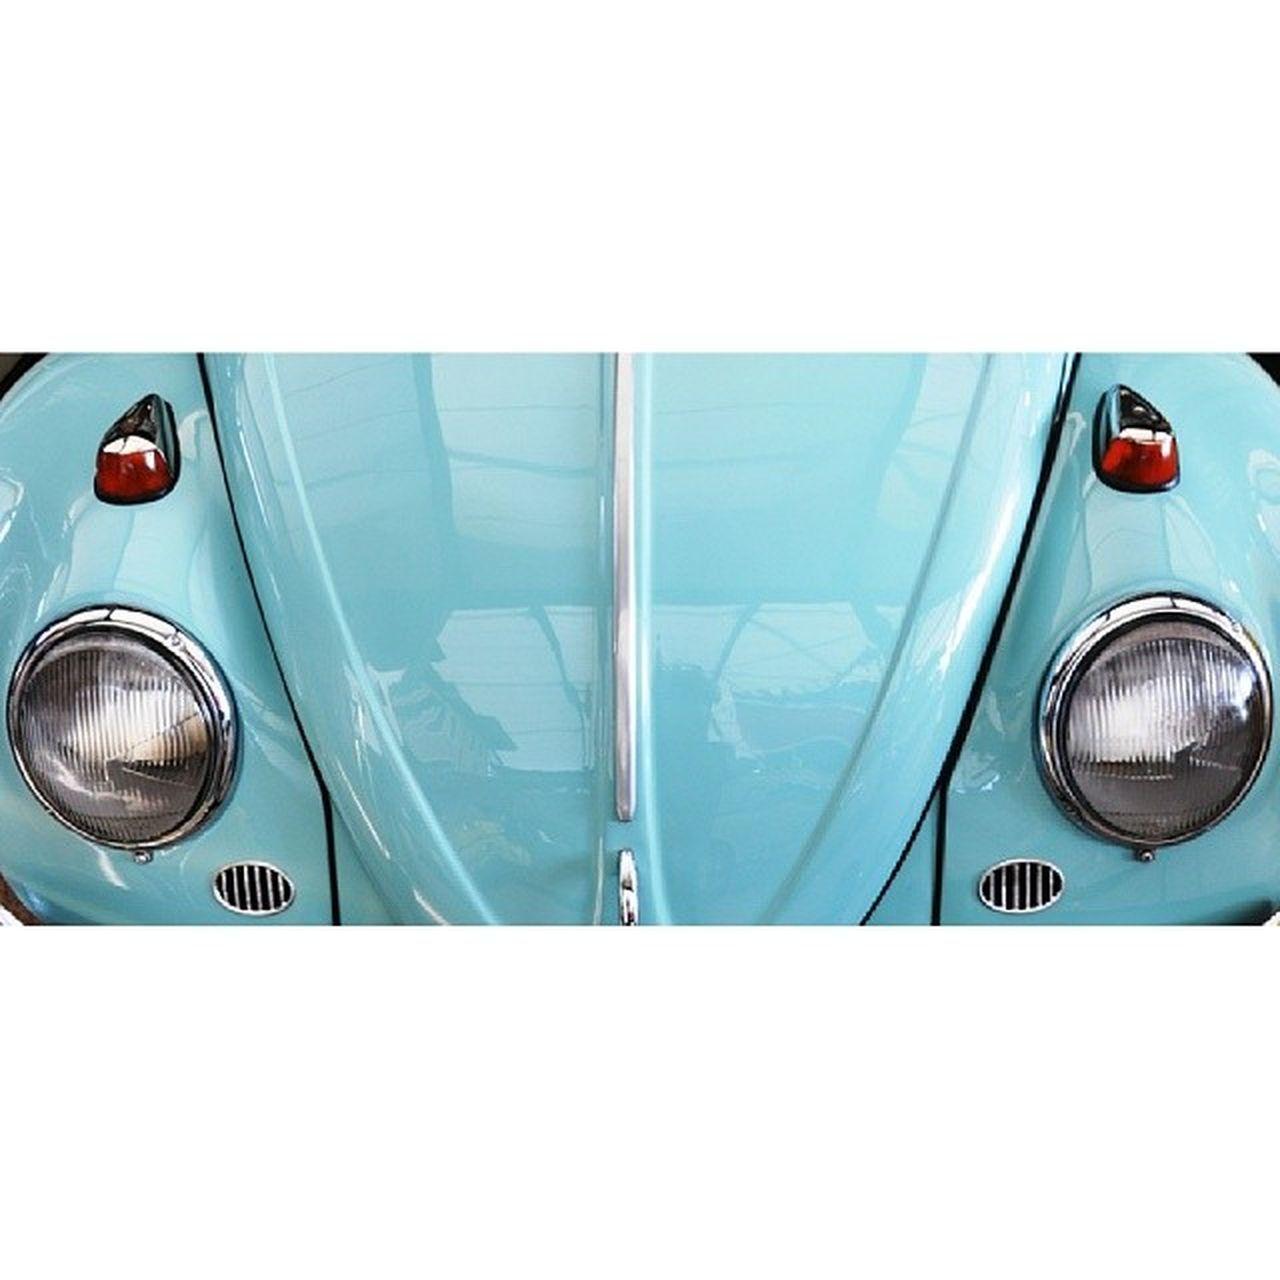 Beetle Turkuaz Car Cute smile